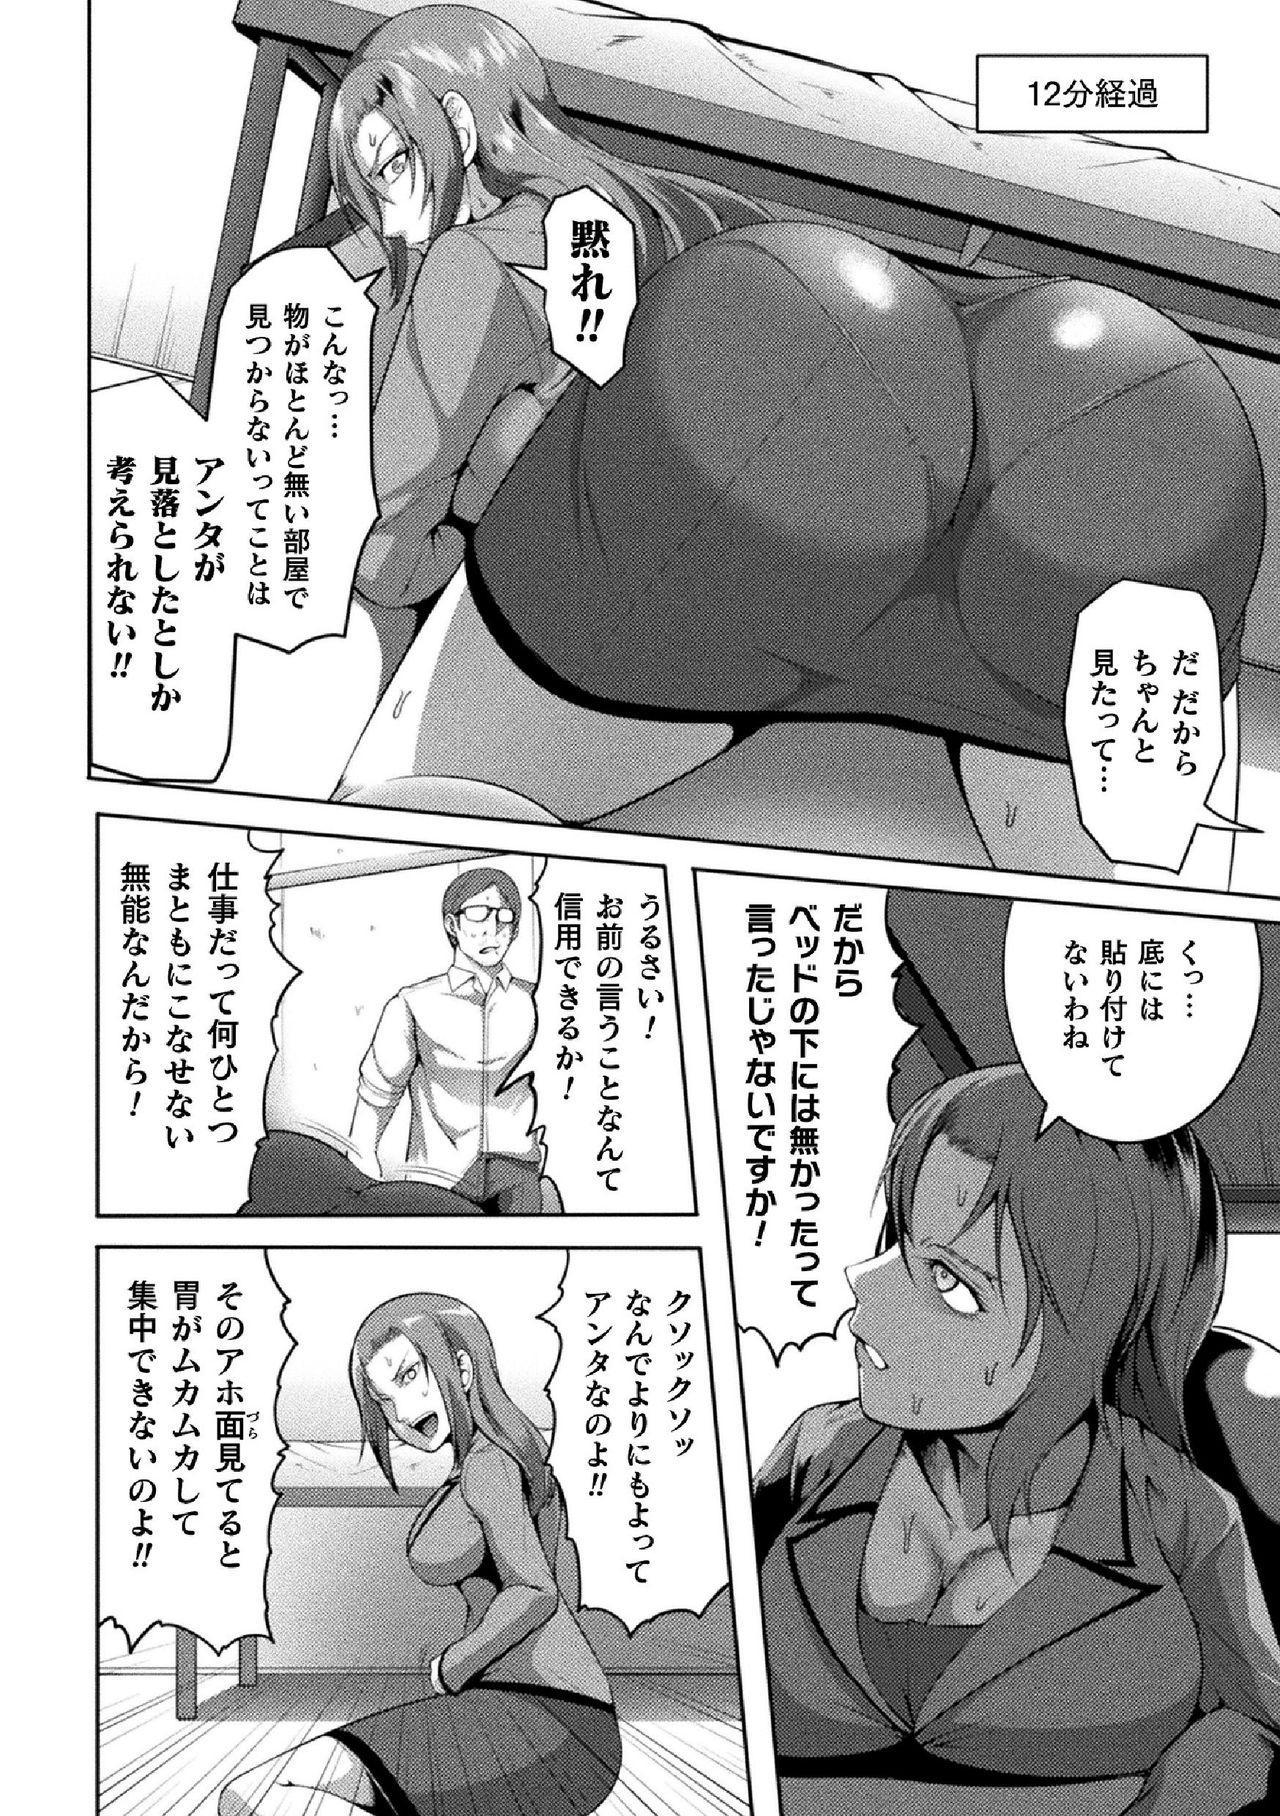 2D Comic Magazine Namaiki Onna ni HaraPun Seisai! Vol. 2 51